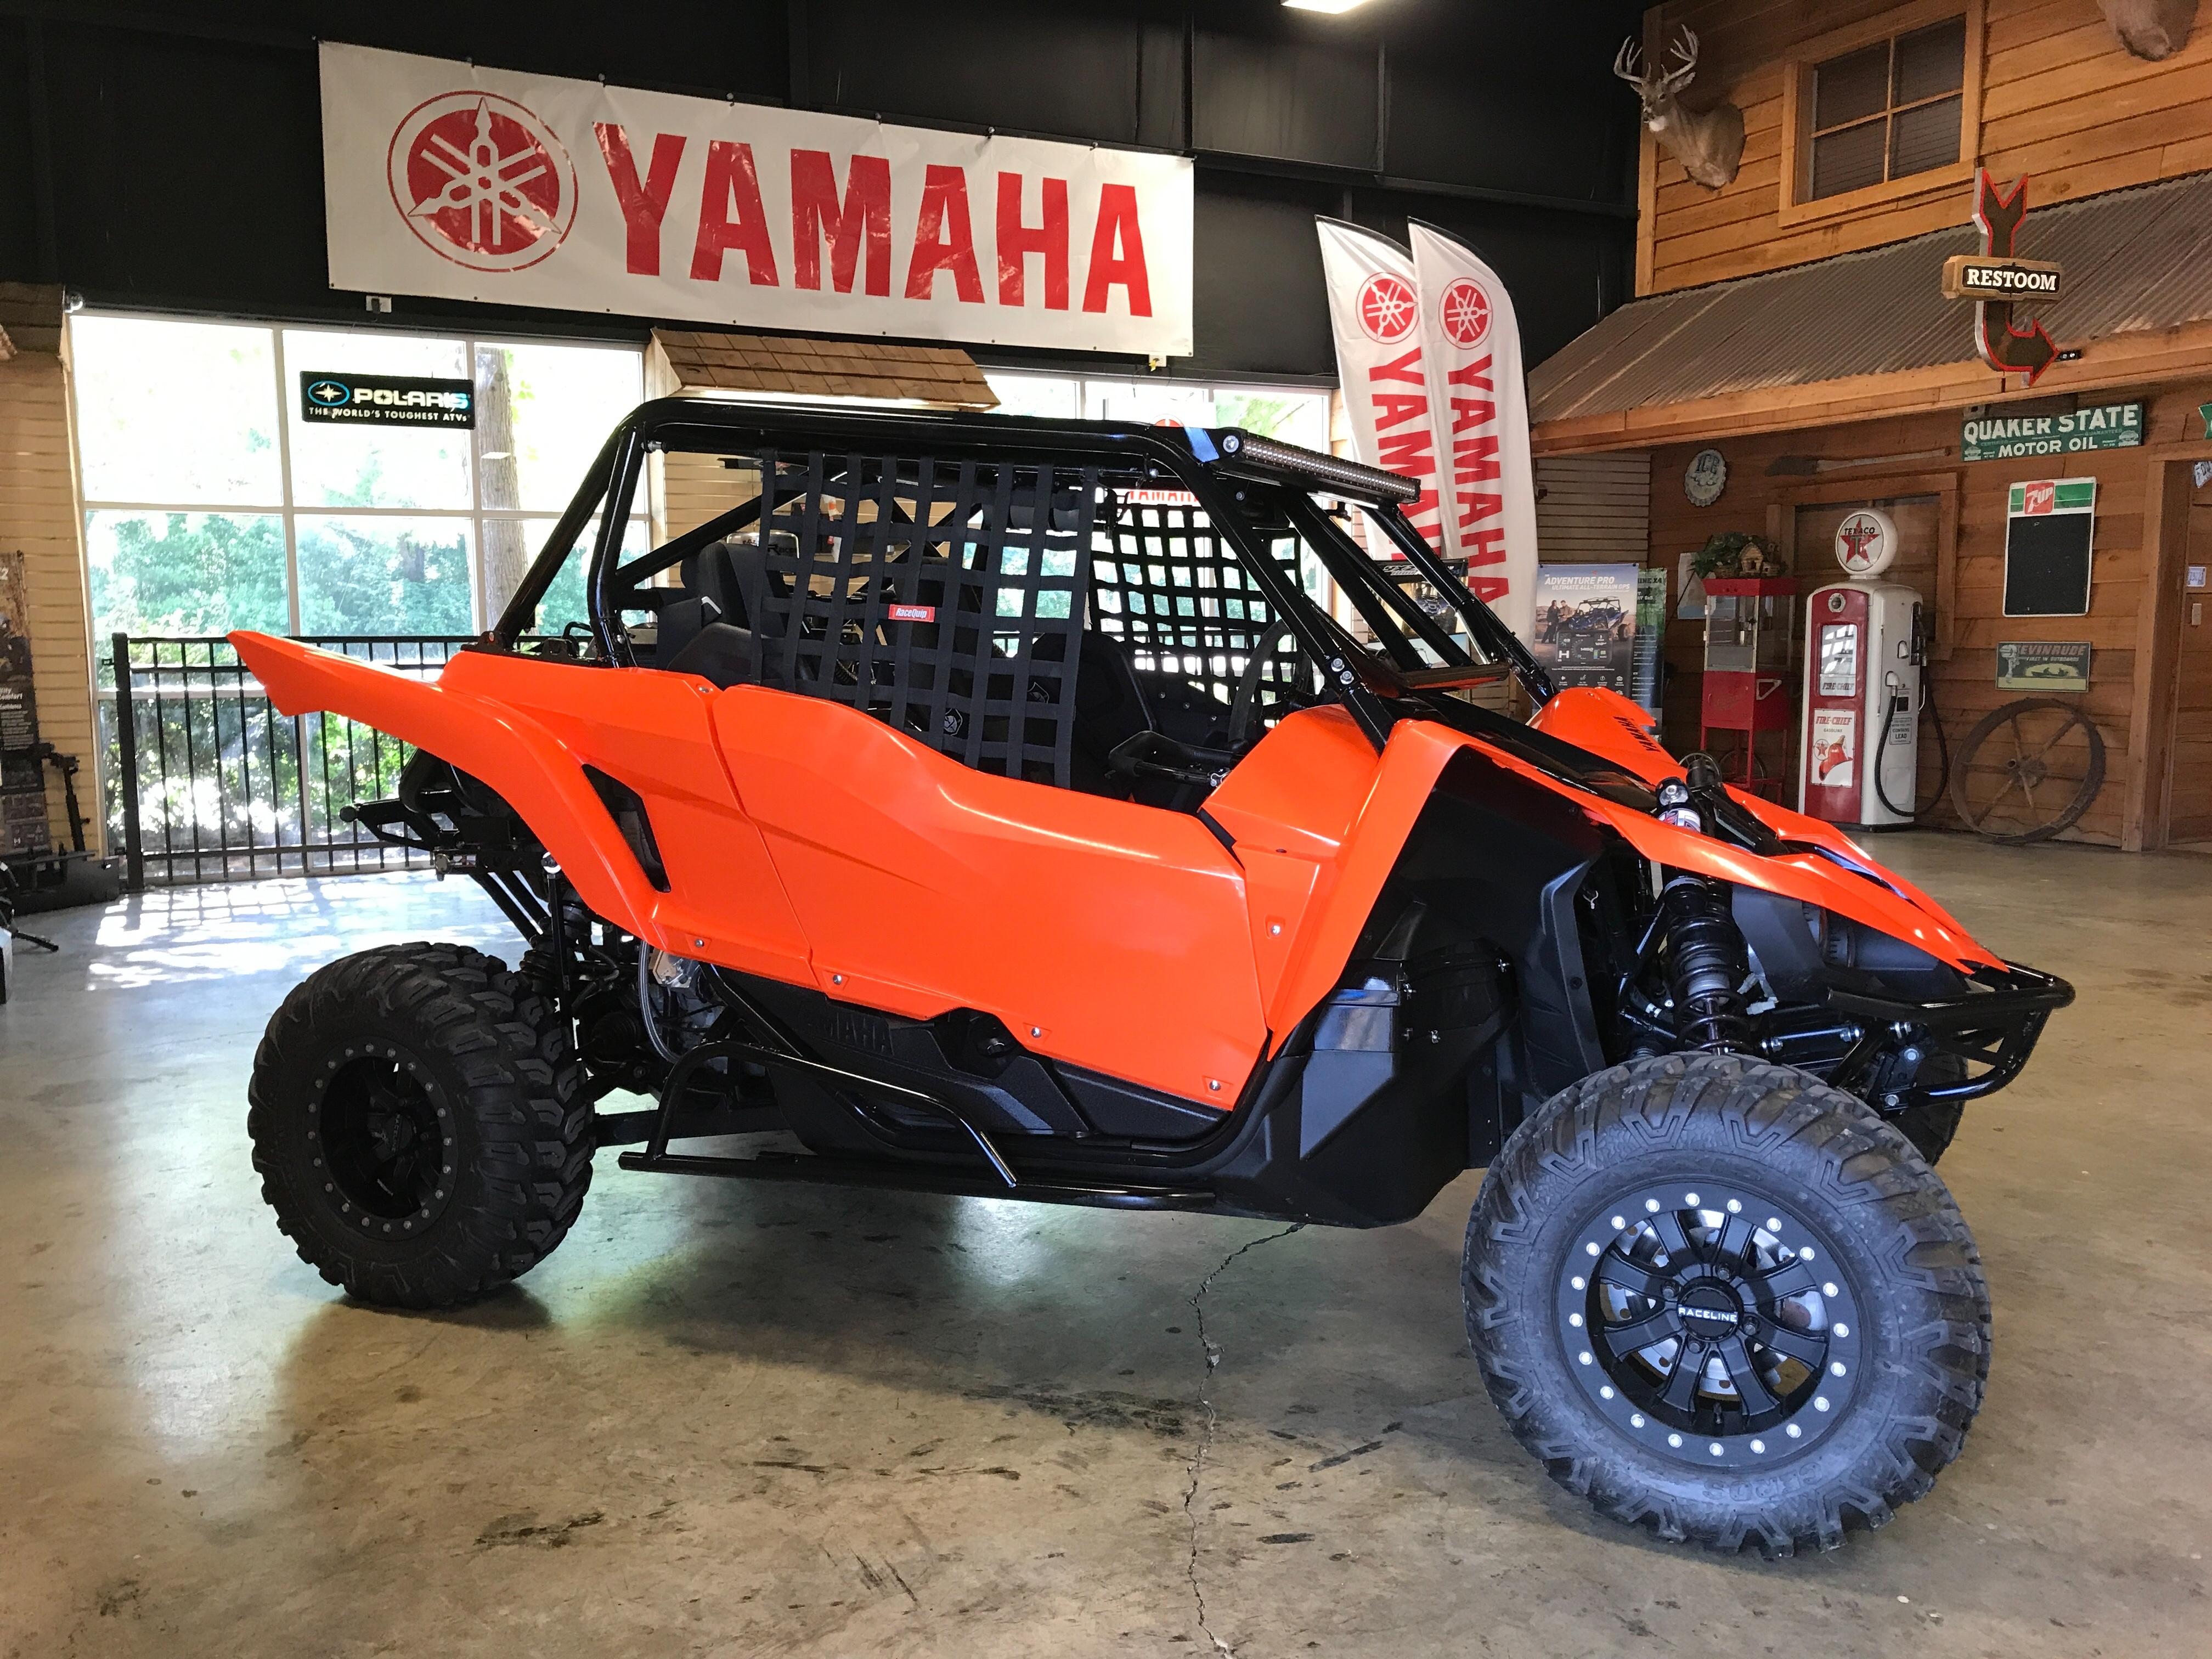 2016 YAMAHA 1000R 1000R at ATV Zone, LLC